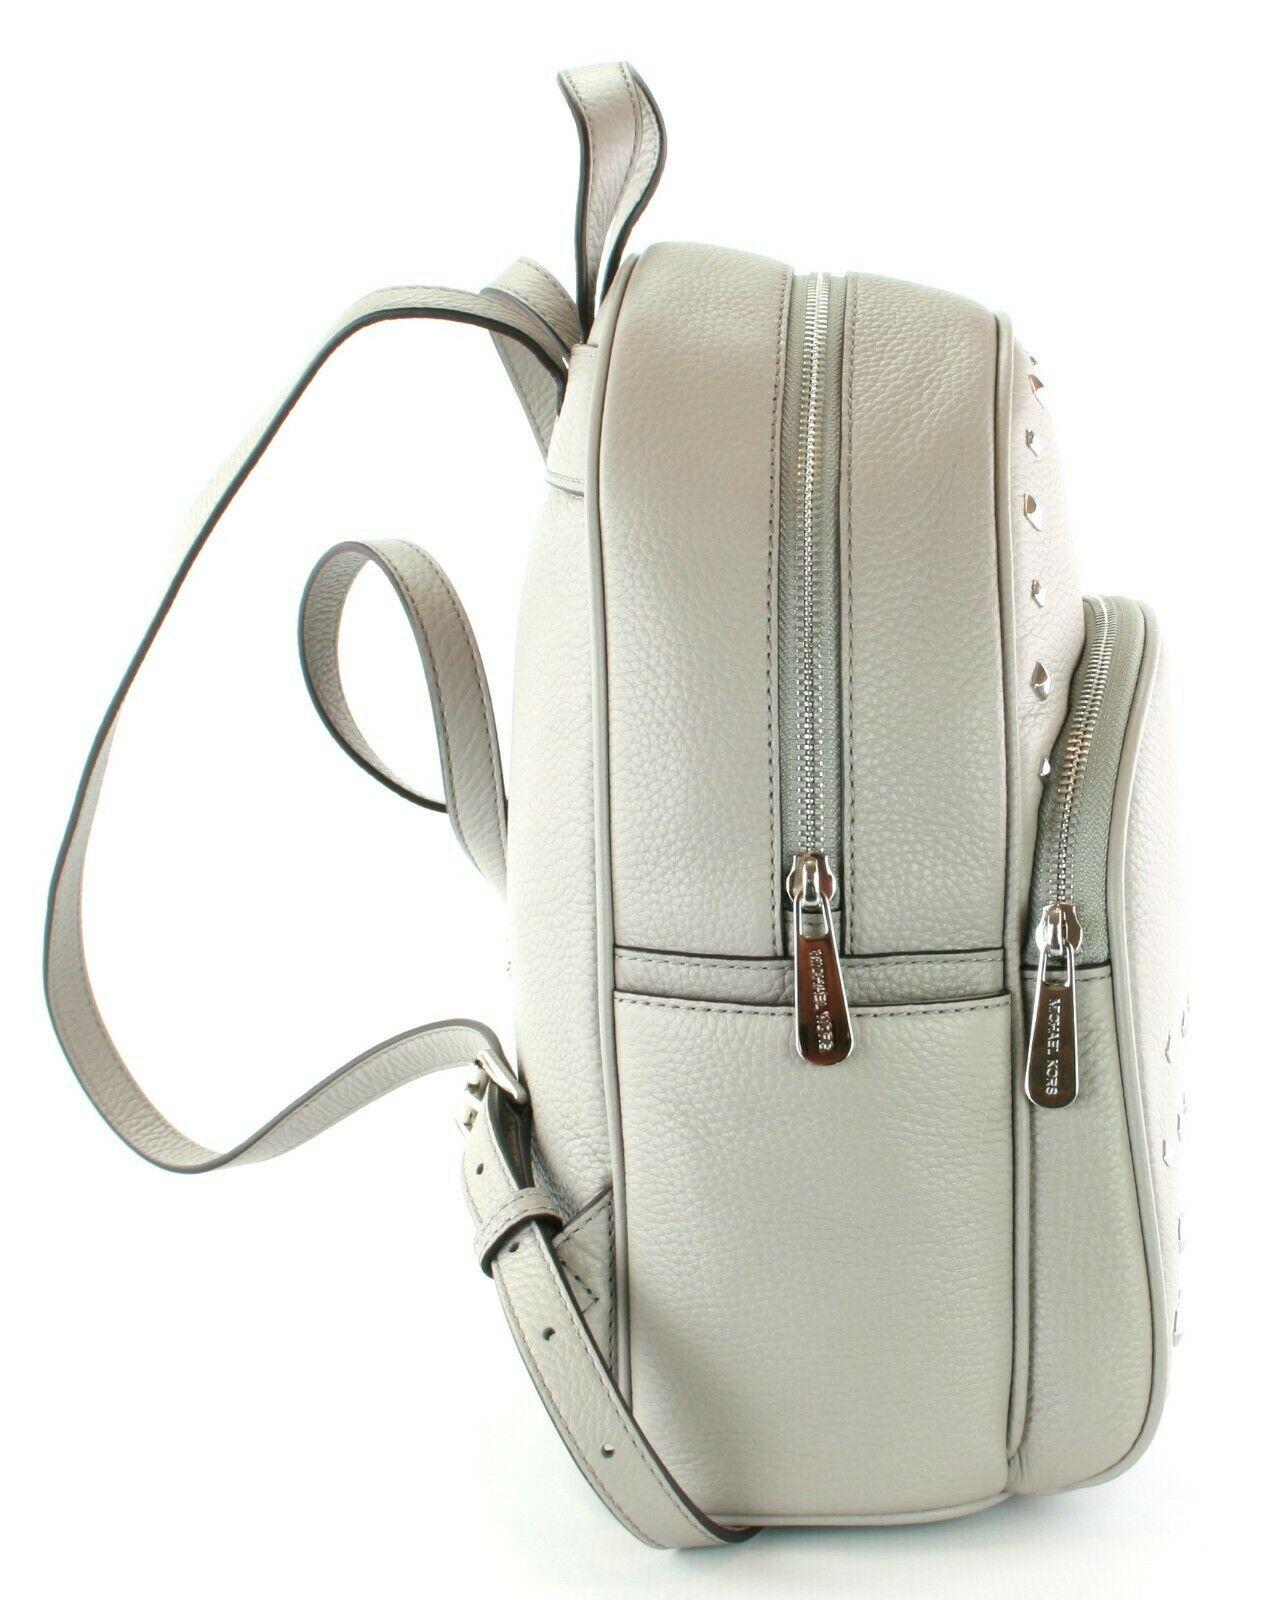 Michael Kors Abbey Medium Backpack Bag Pearl Grey Studded Leather RRP 310